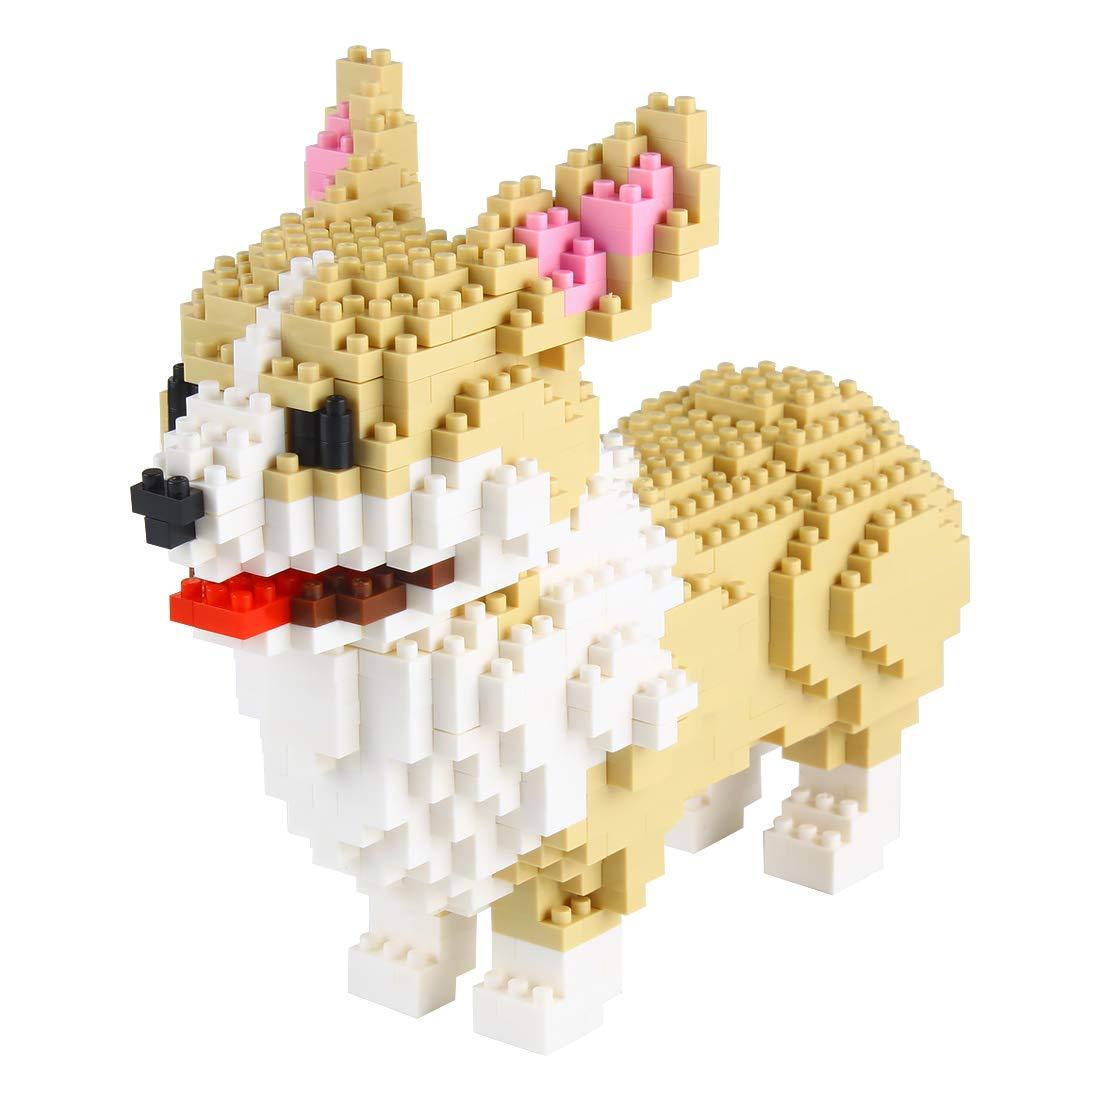 Larcele Mini Dog Building Blocks Pet Building Toy Bricks,950 Pieces KLJM-02 (Welsh Corgi)